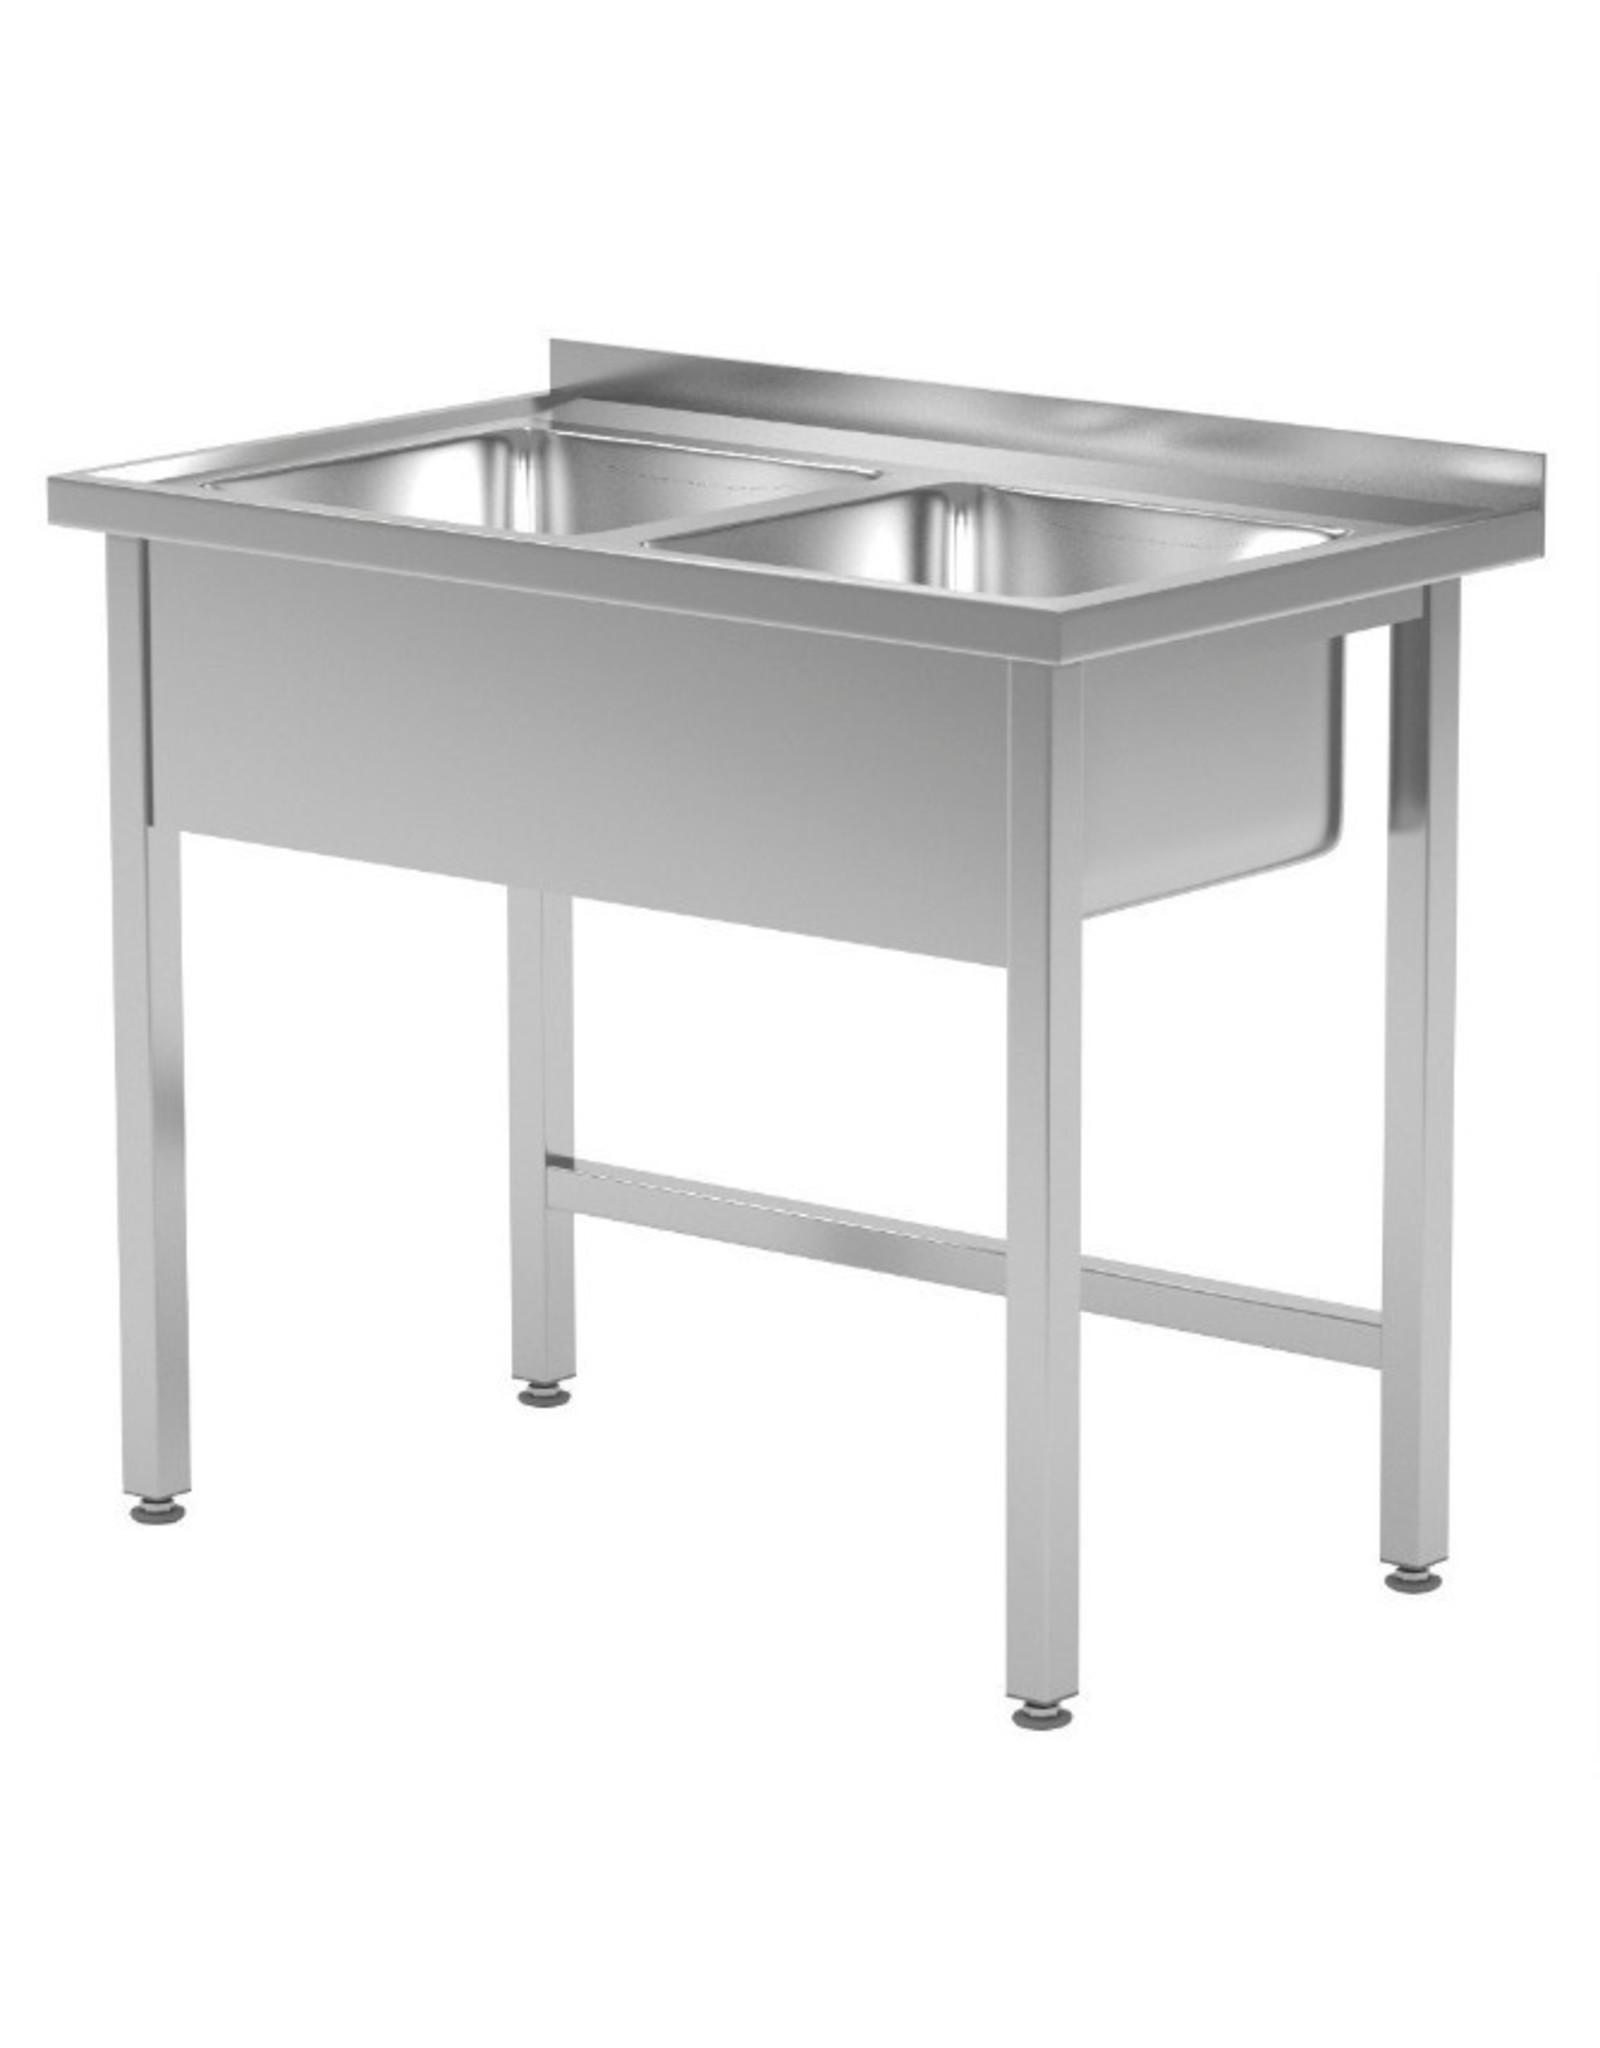 Spoeltafel met 2 grote spoelbakken | open onderkant | 1000mm breed | 600 of 700mm diep